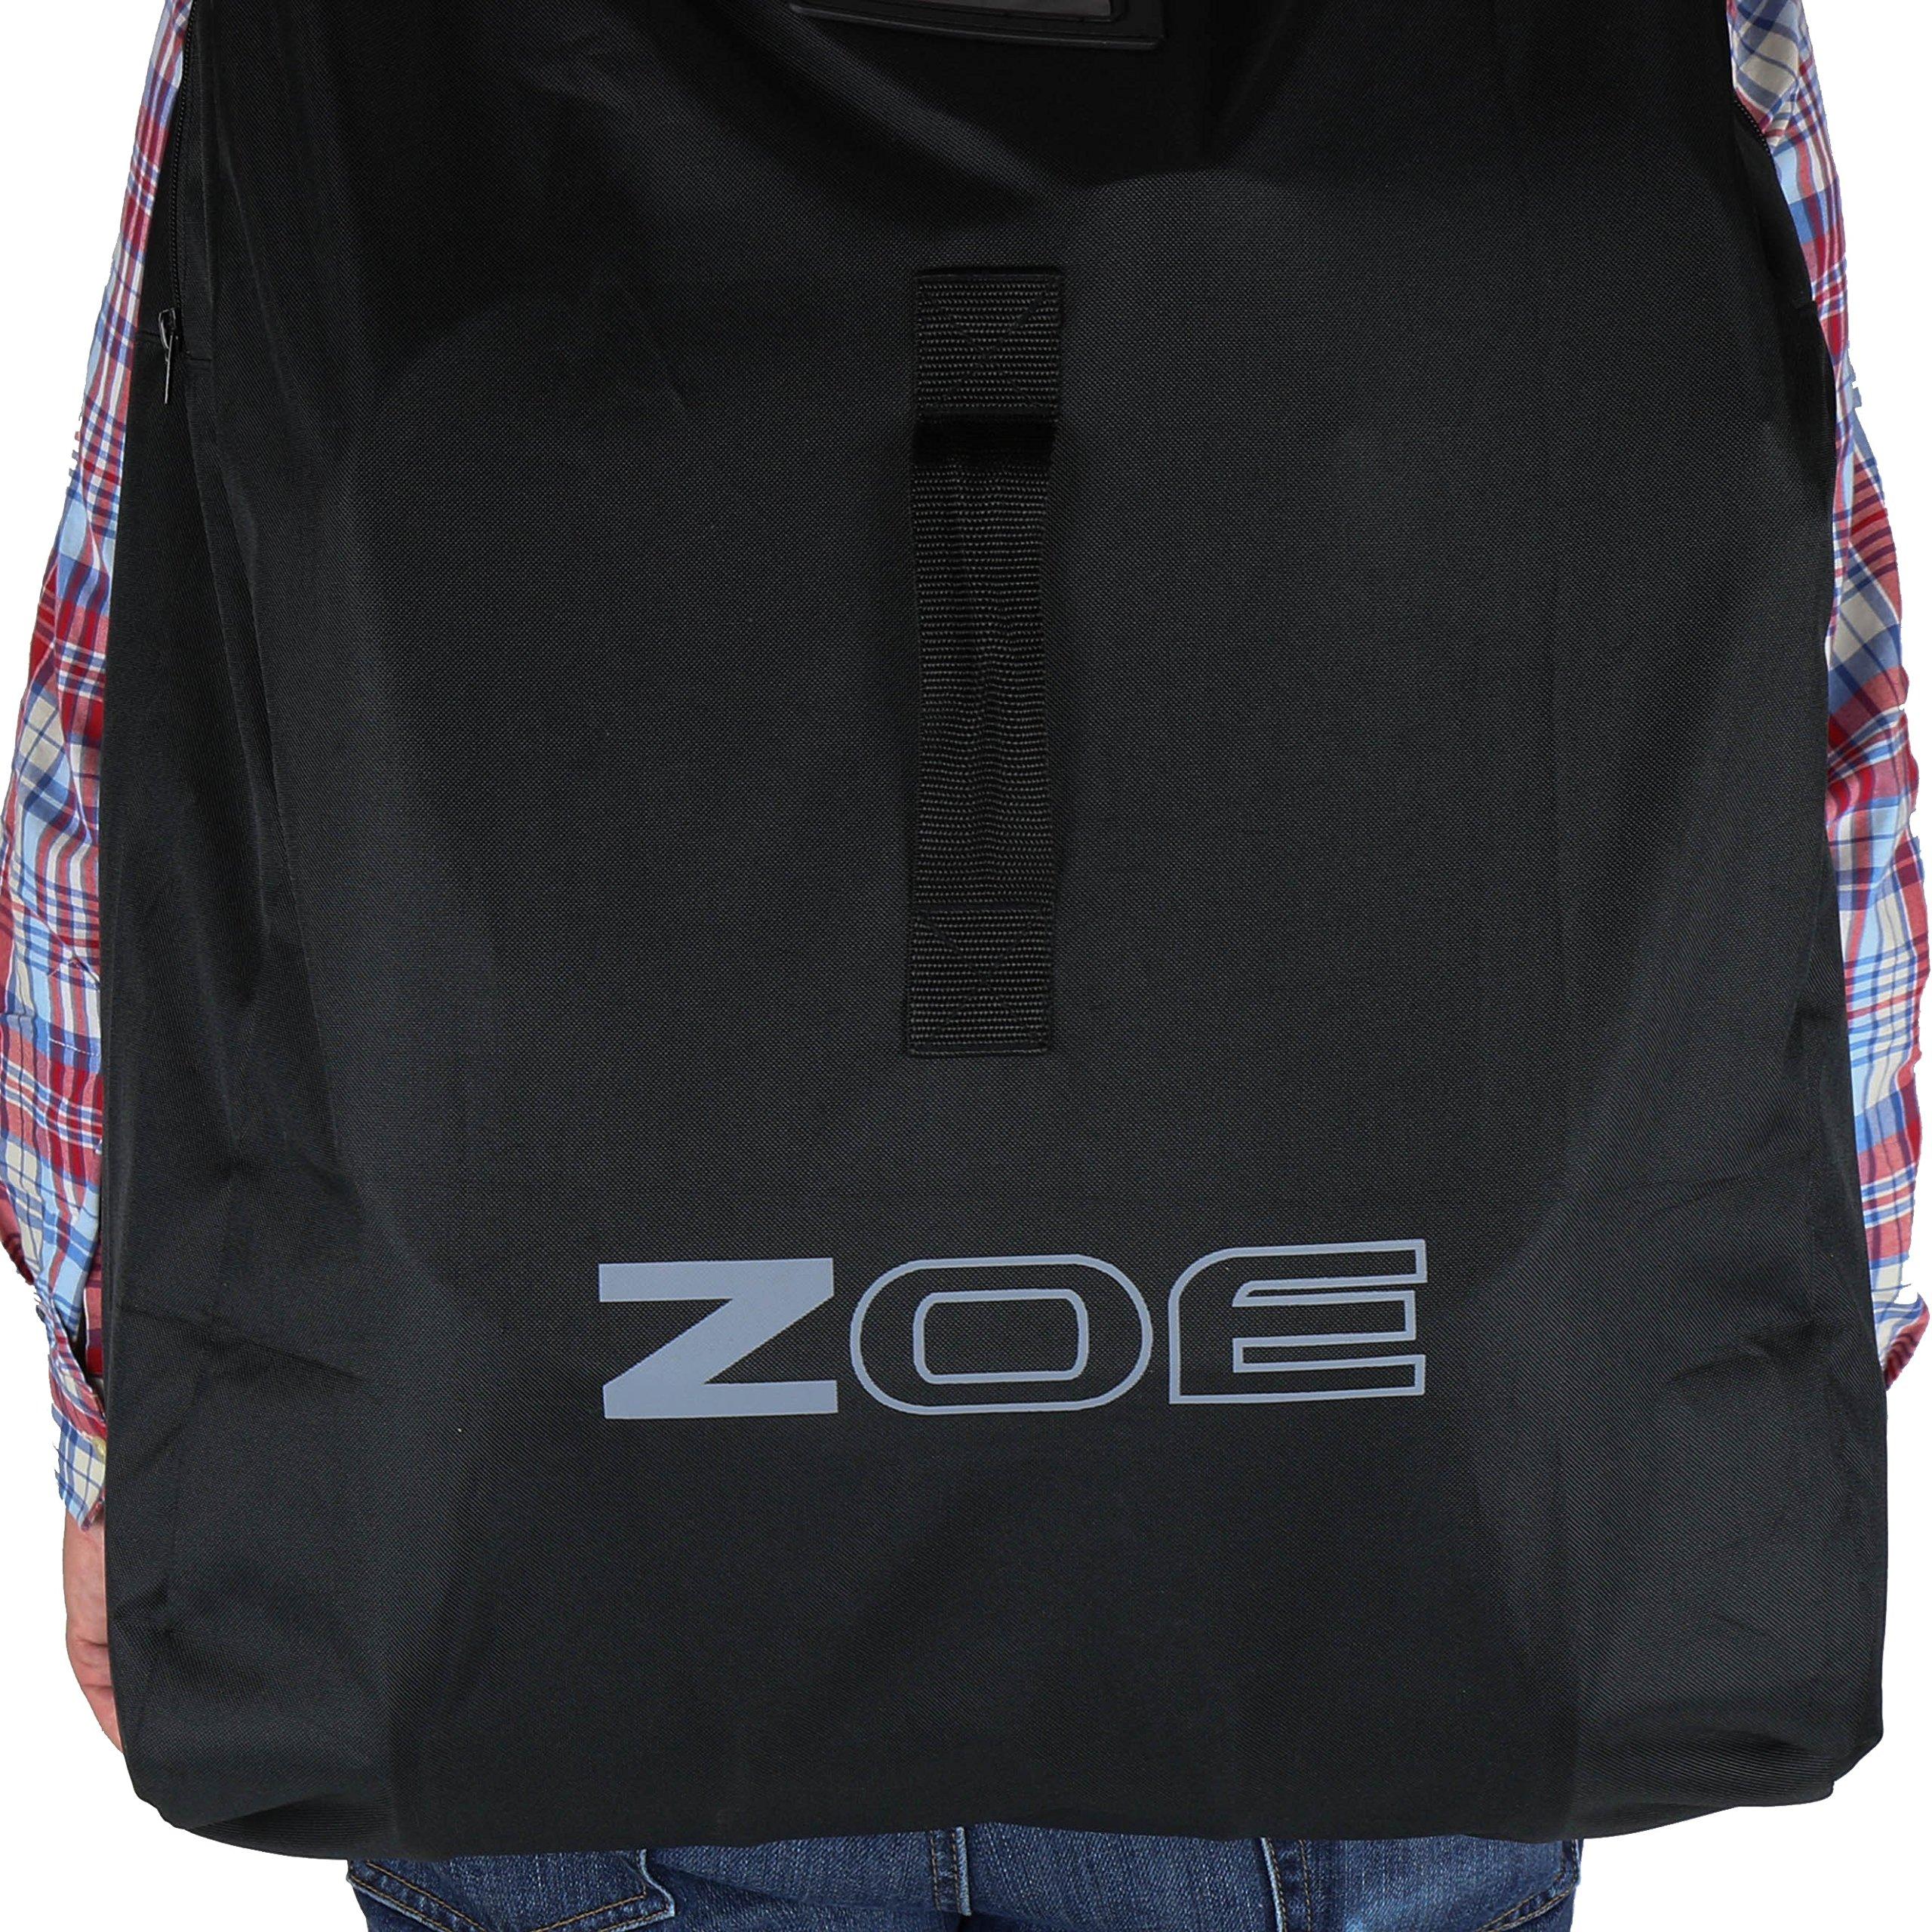 ZOE Stroller Travel Backpack & Storage Bag (XL1) by ZOE (Image #7)